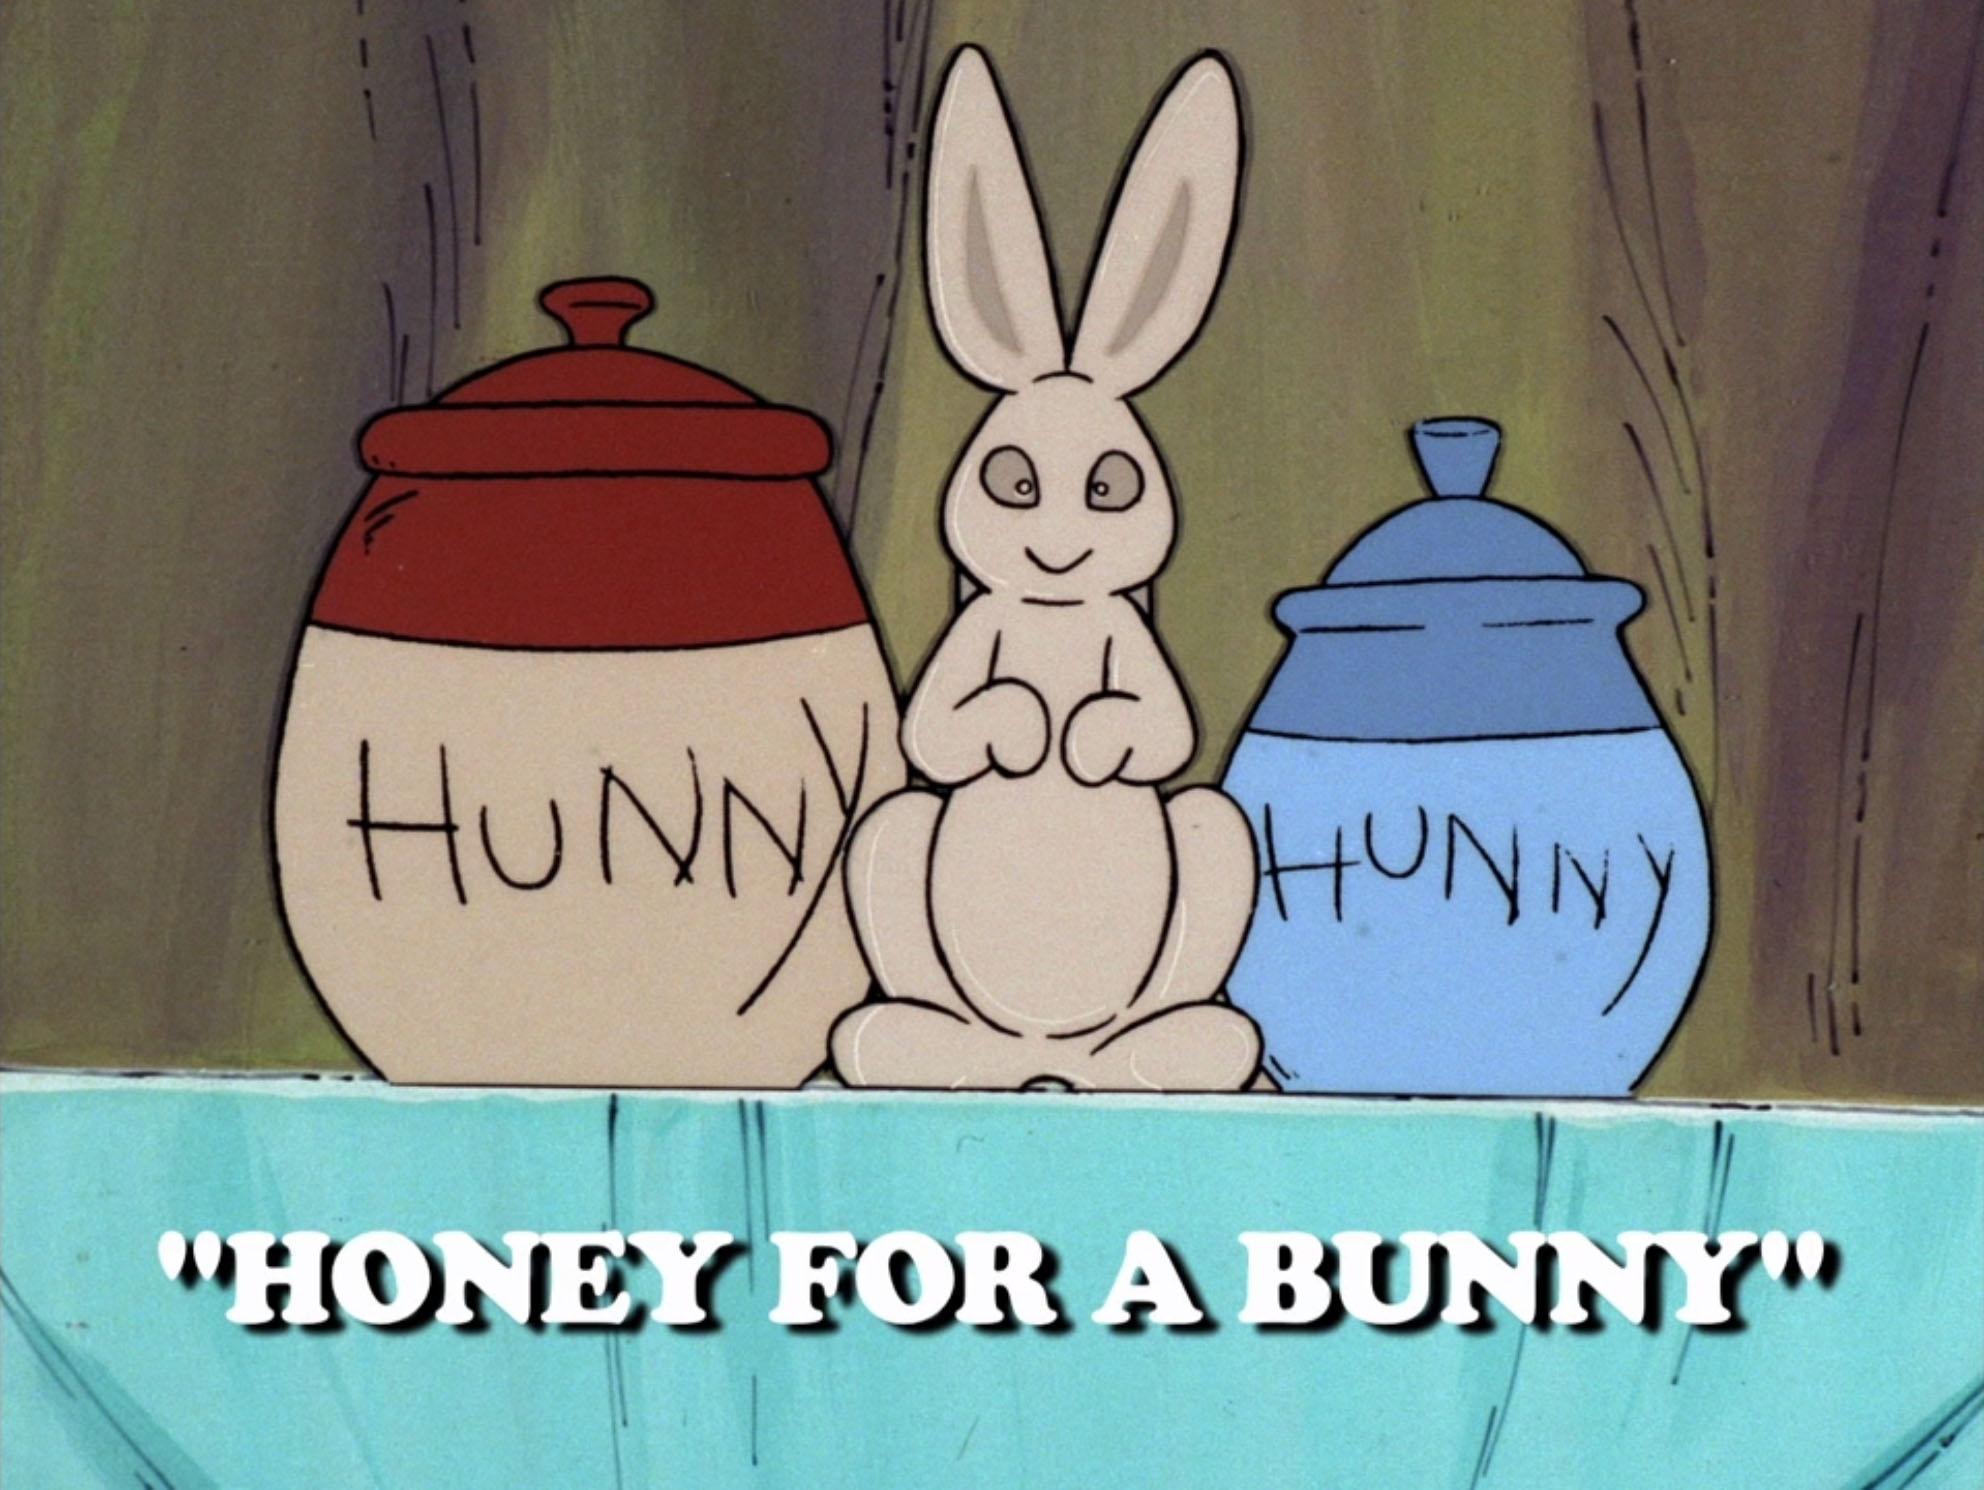 File:Honeybunny.jpg